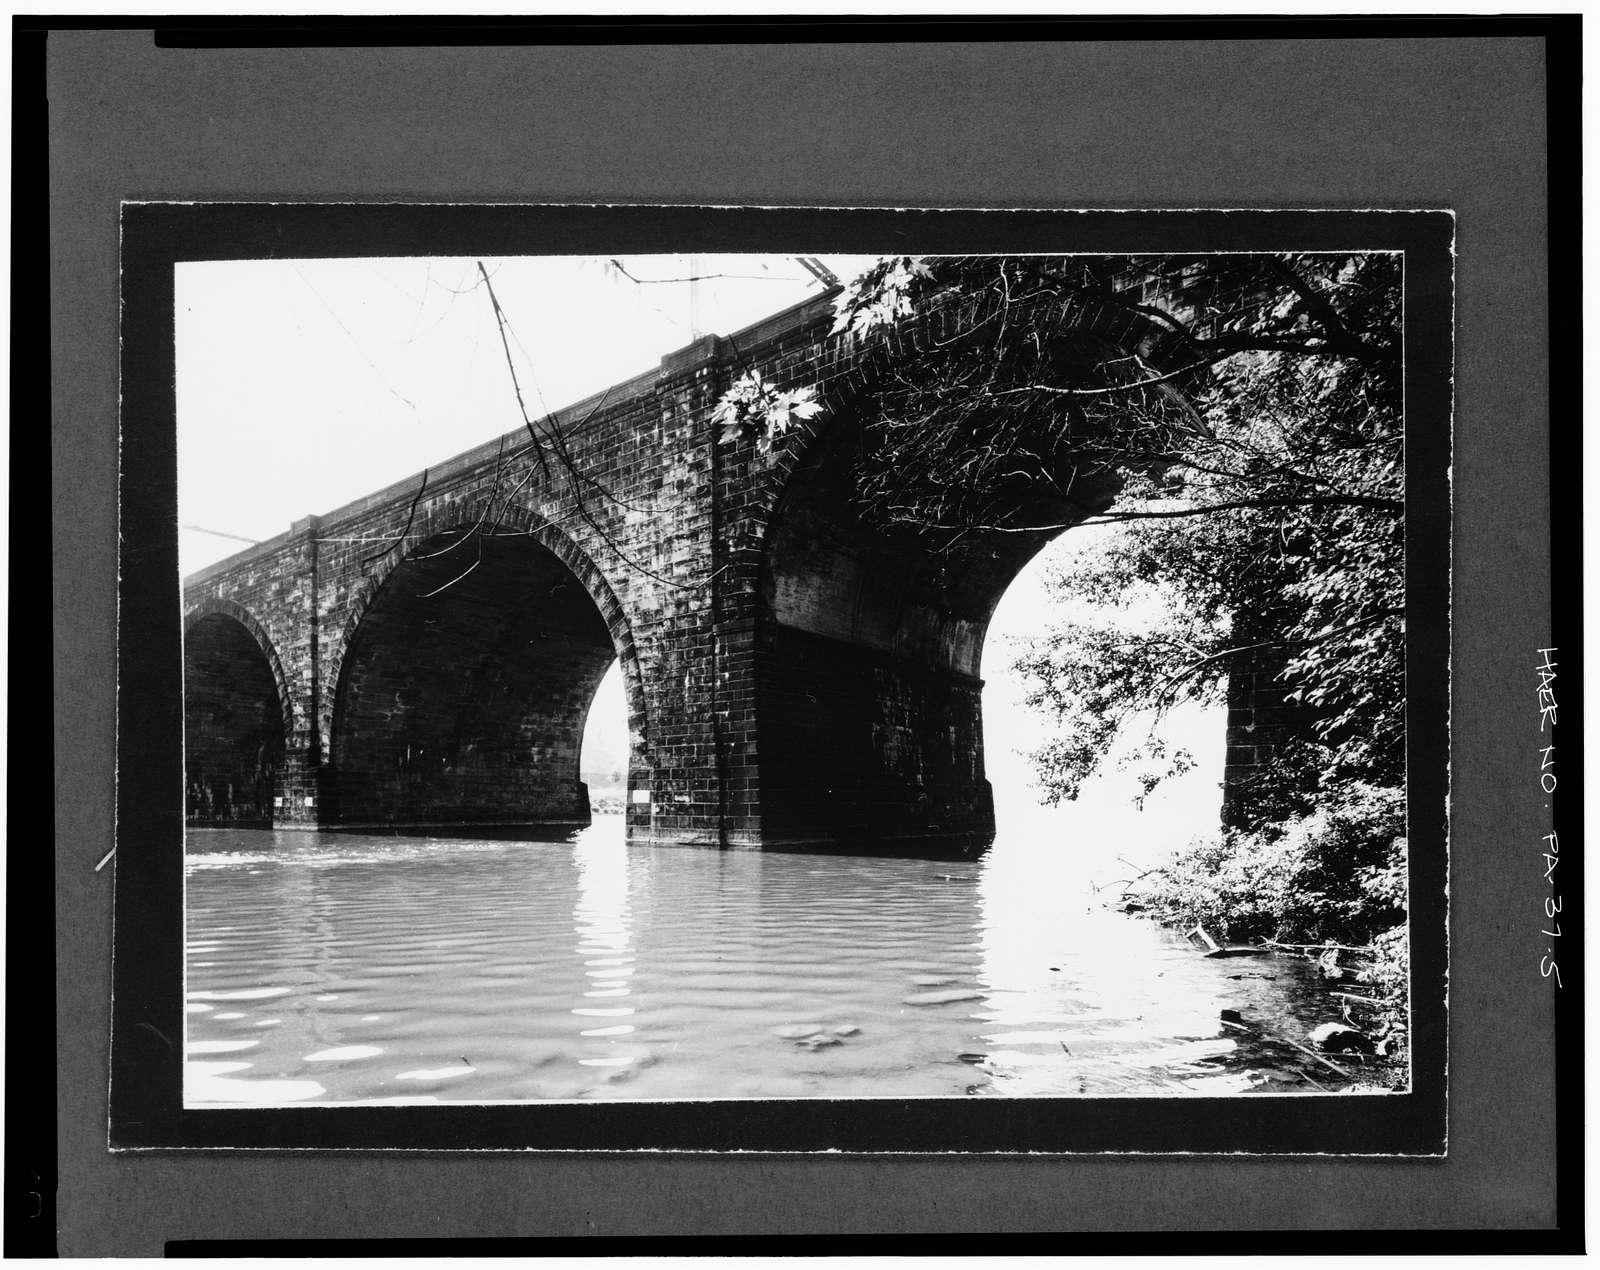 Connecting Railway, Schuylkill River Bridge, Spanning Schuylkill River, north of Girard Avenue Bridge, Philadelphia, Philadelphia County, PA